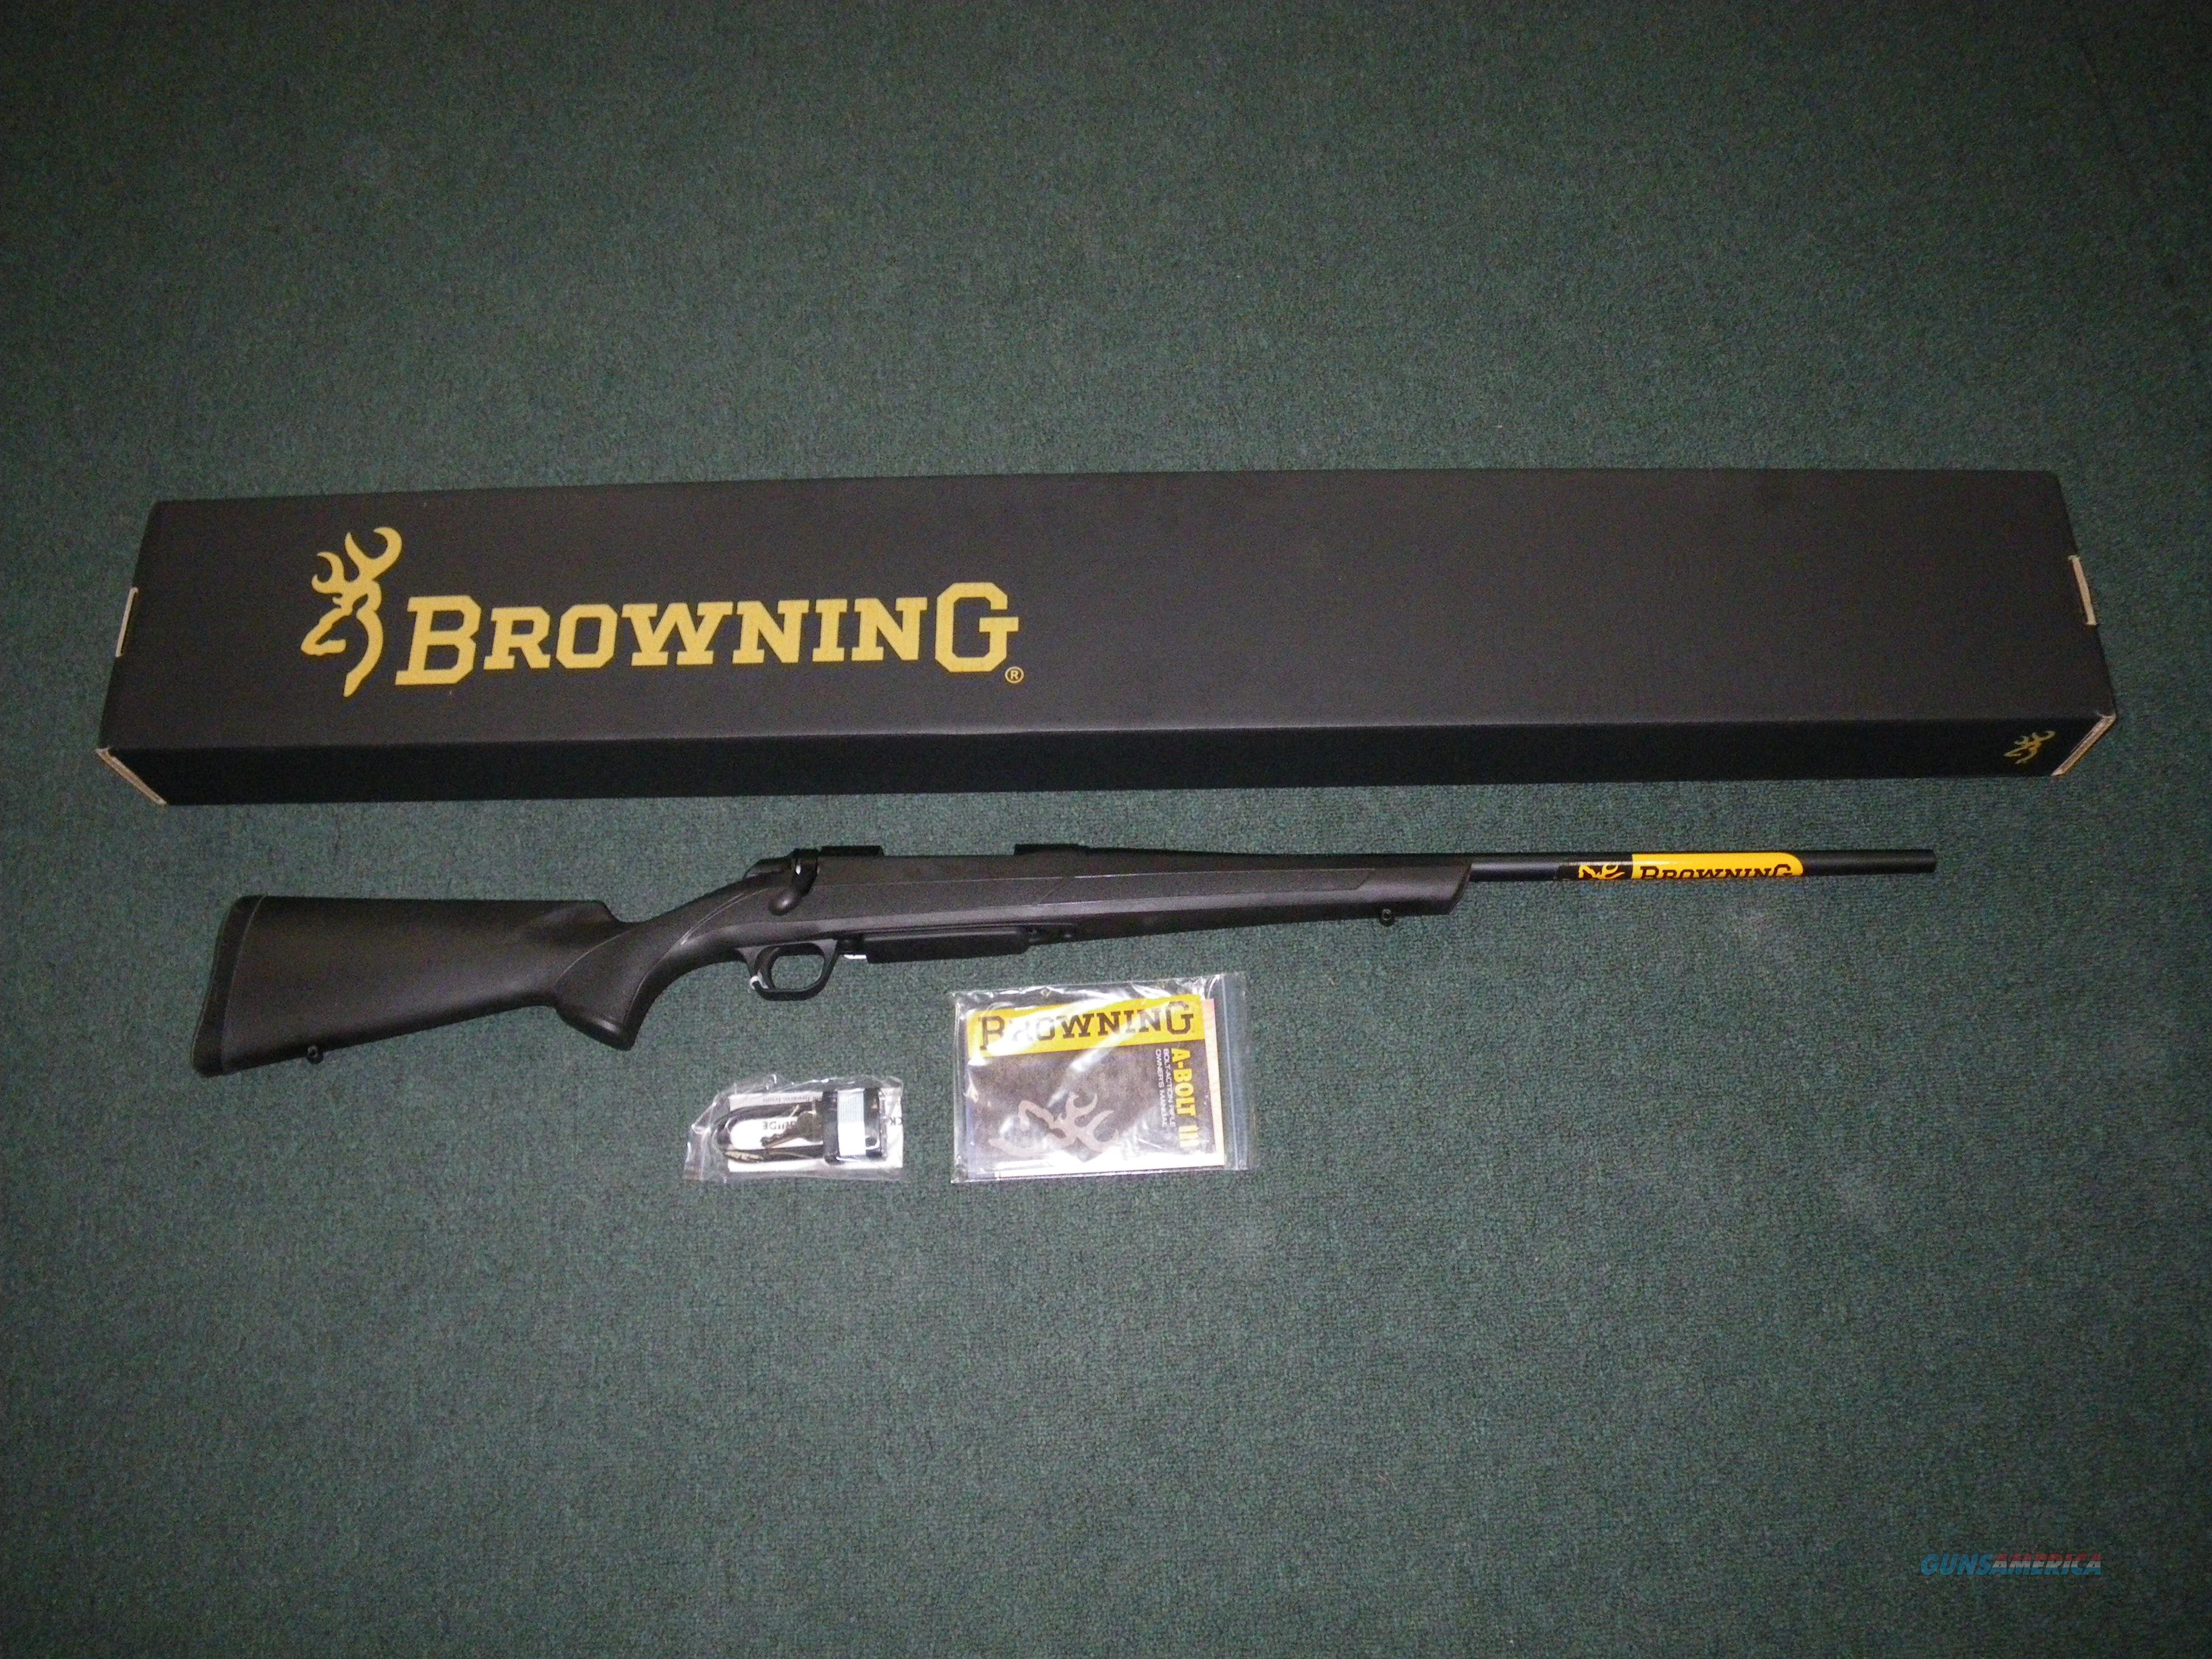 "Browning A-bolt III AB3 22"" 7mm-08 Remington New! #035800216  Guns > Rifles > Browning Rifles > Bolt Action > Hunting > Blue"